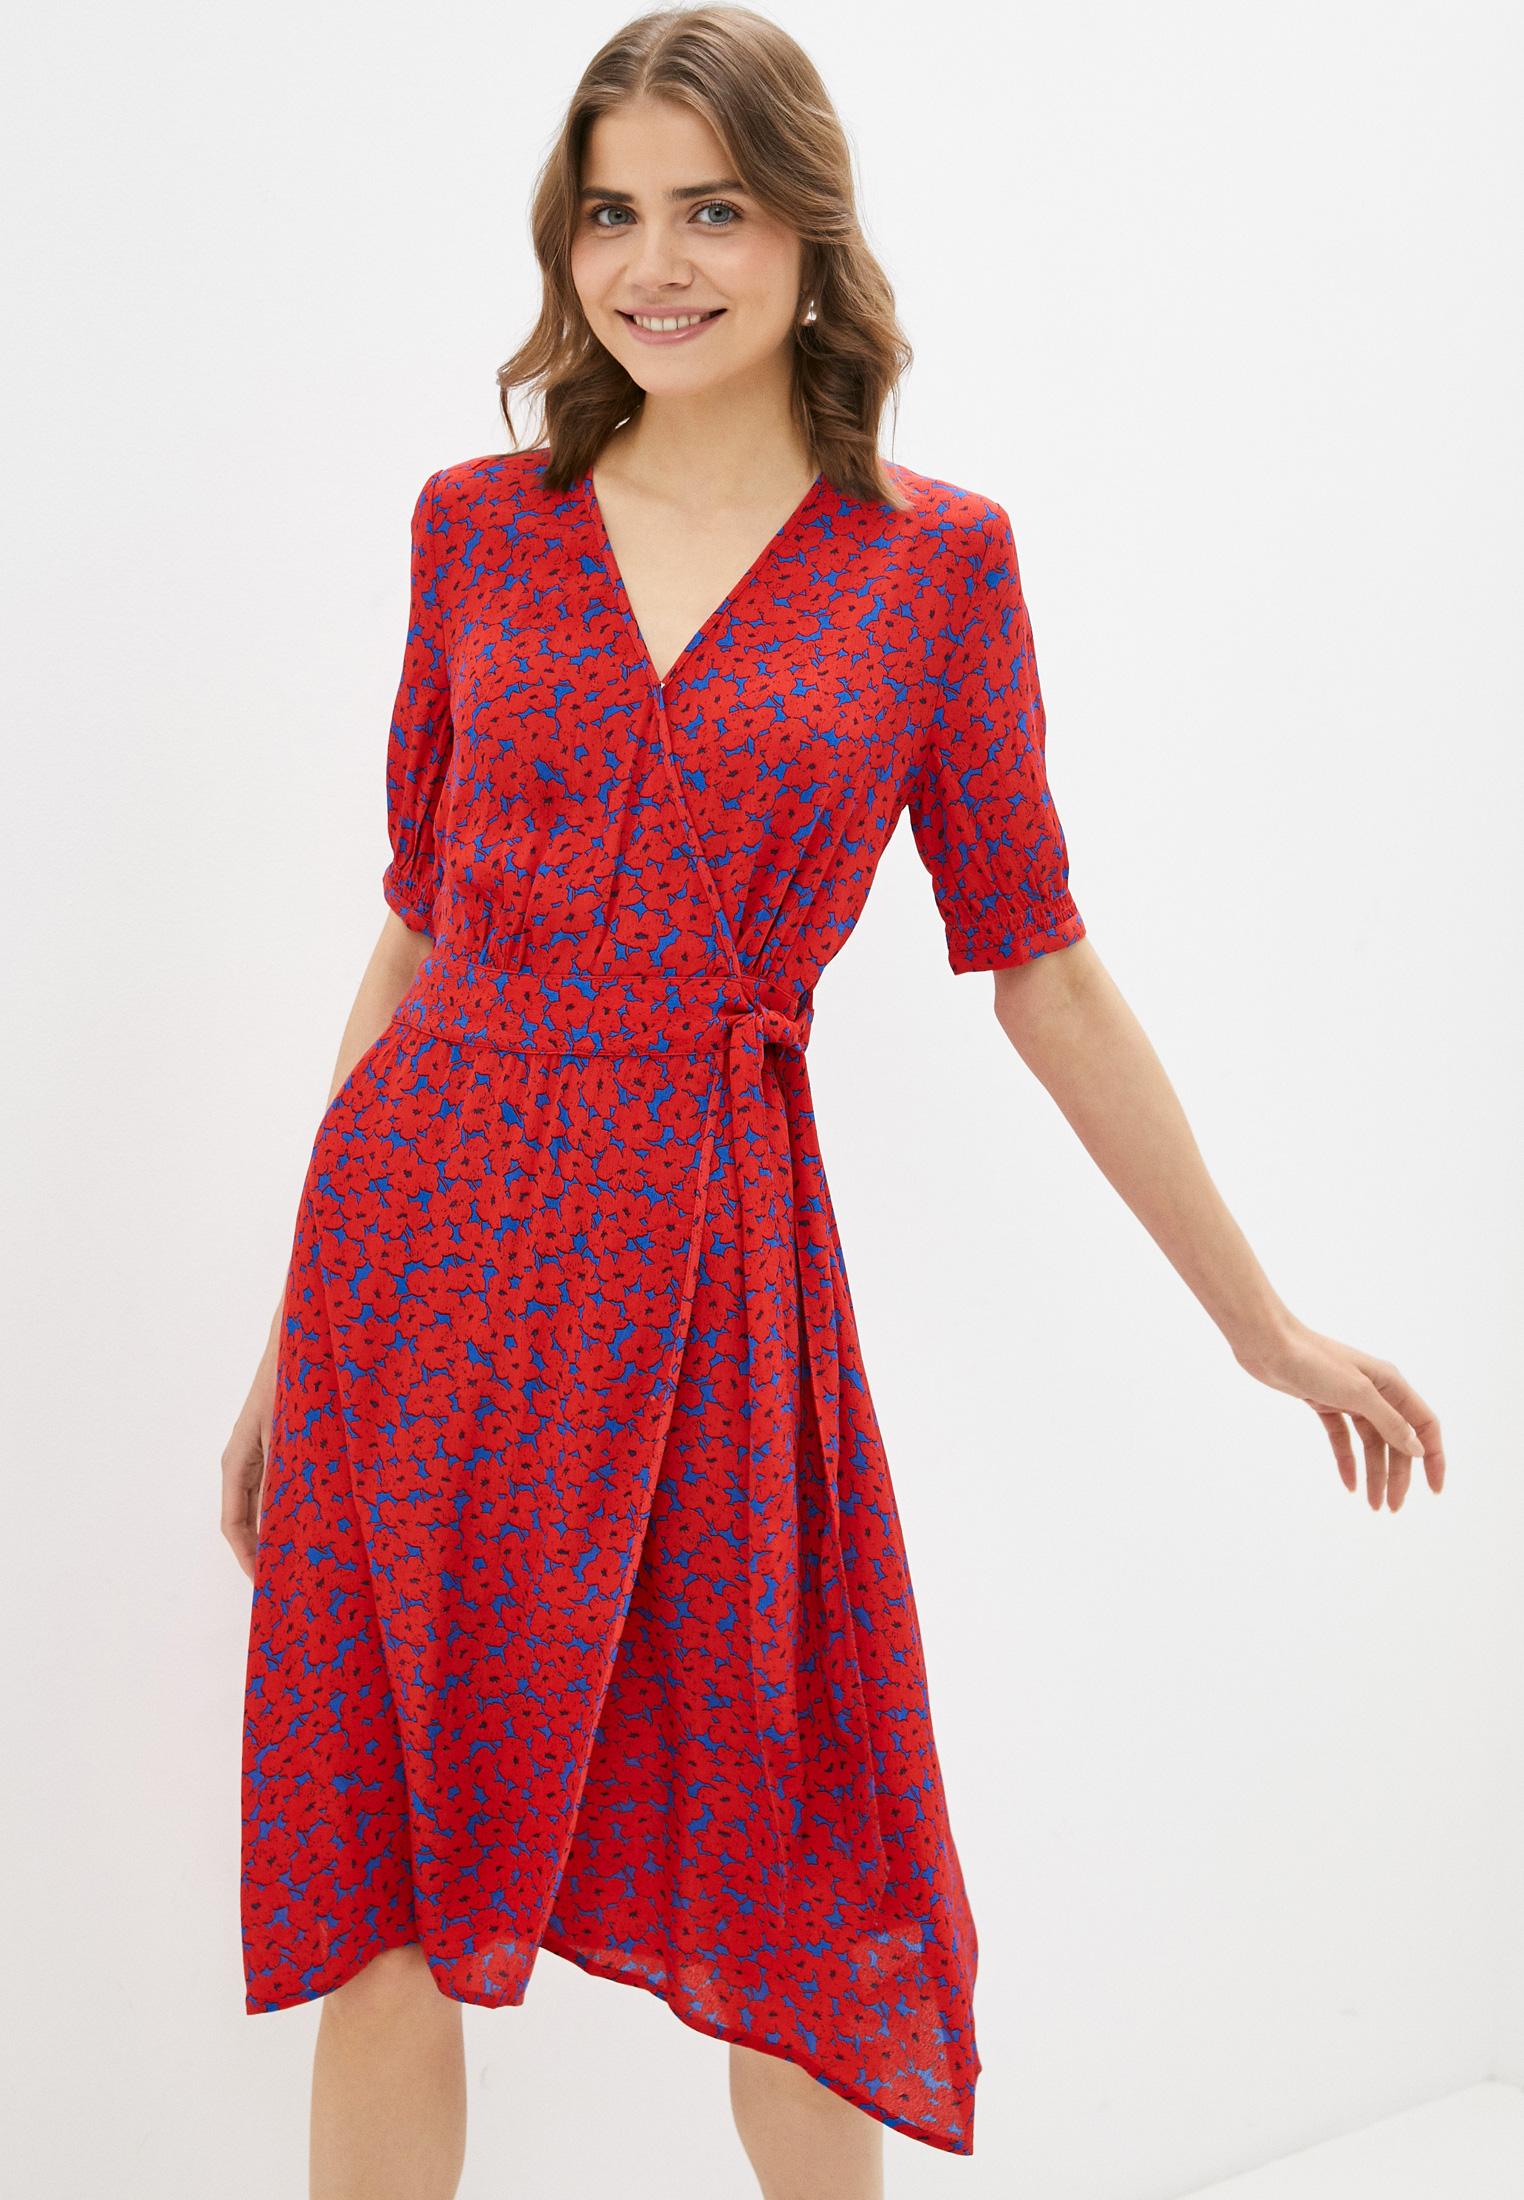 Платье Tommy Hilfiger (Томми Хилфигер) WW0WW30351: изображение 1